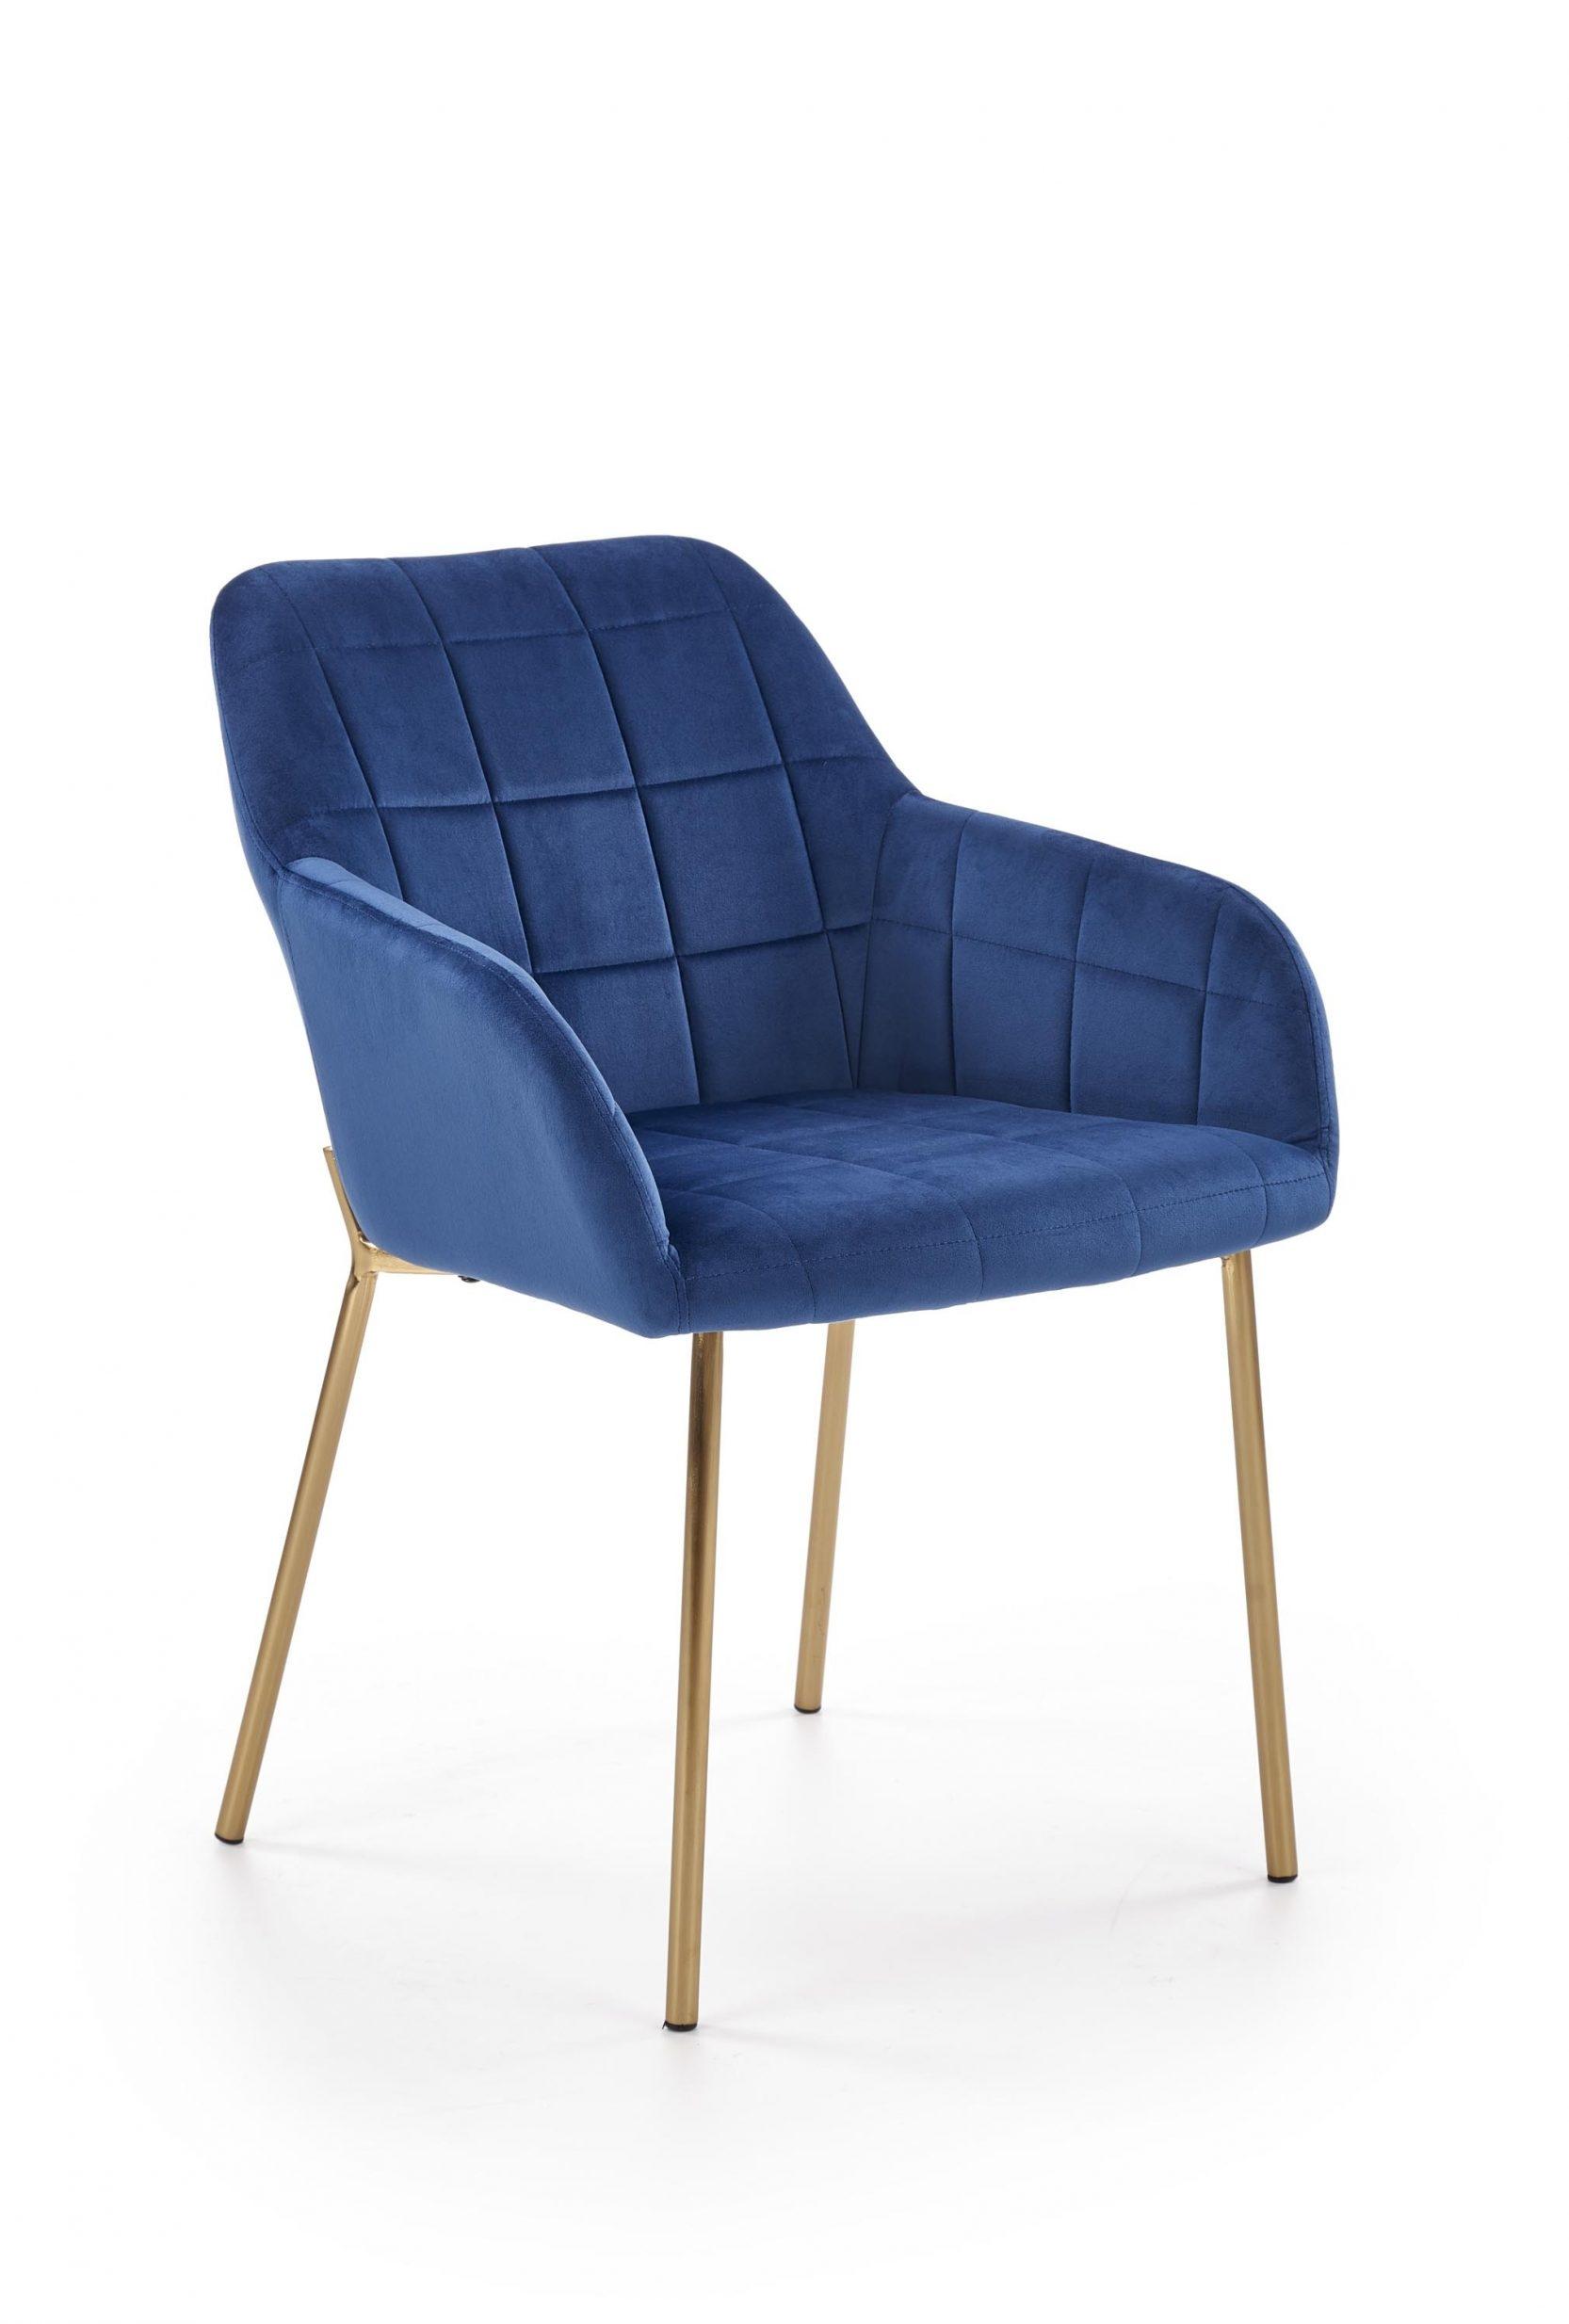 Scaun tapitat cu stofa, cu picioare metalice K306 Velvet Albastru Inchis / Auriu, l58xA57xH80 cm imagine